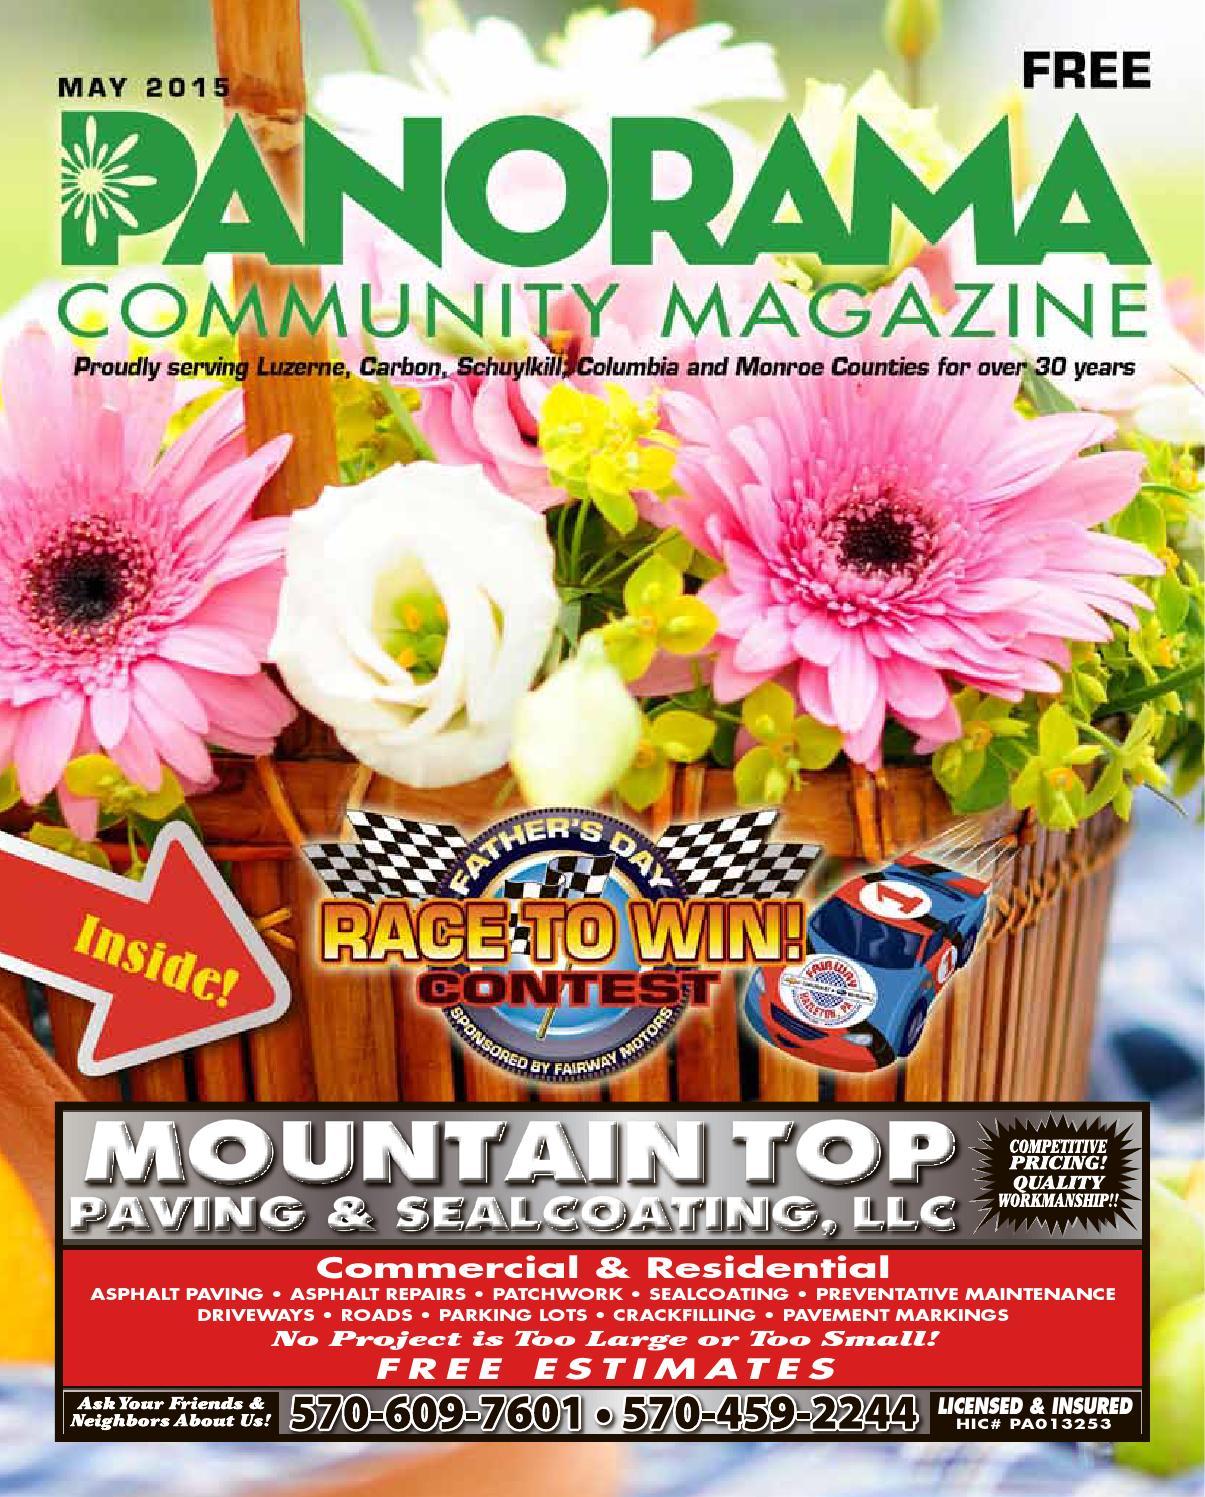 Kitchen gallery design center north broad street west hazleton pa - Panorama Community Magazine May 2015 By Panorama Community Magazine Issuu